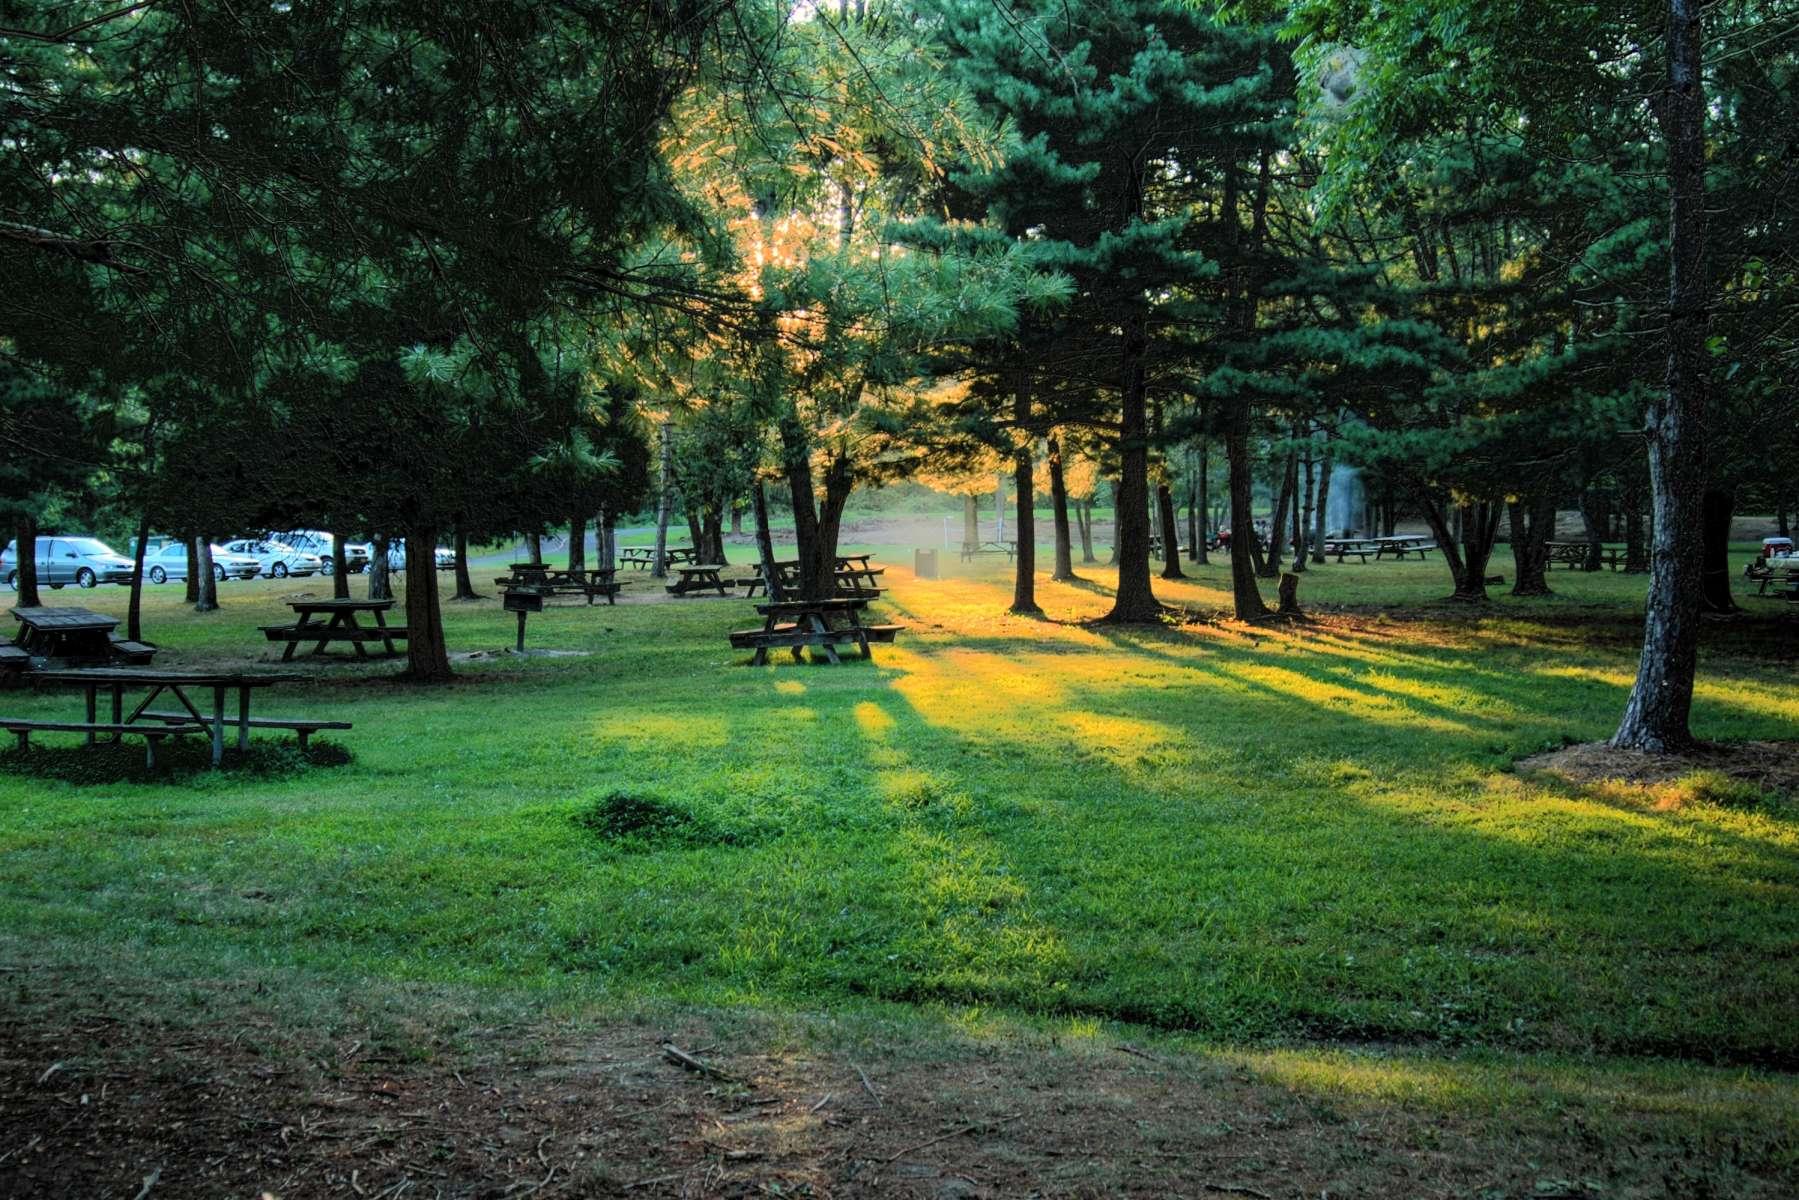 Nockamixon Park Campground, Nockamixon Park, PA: 5 Photos